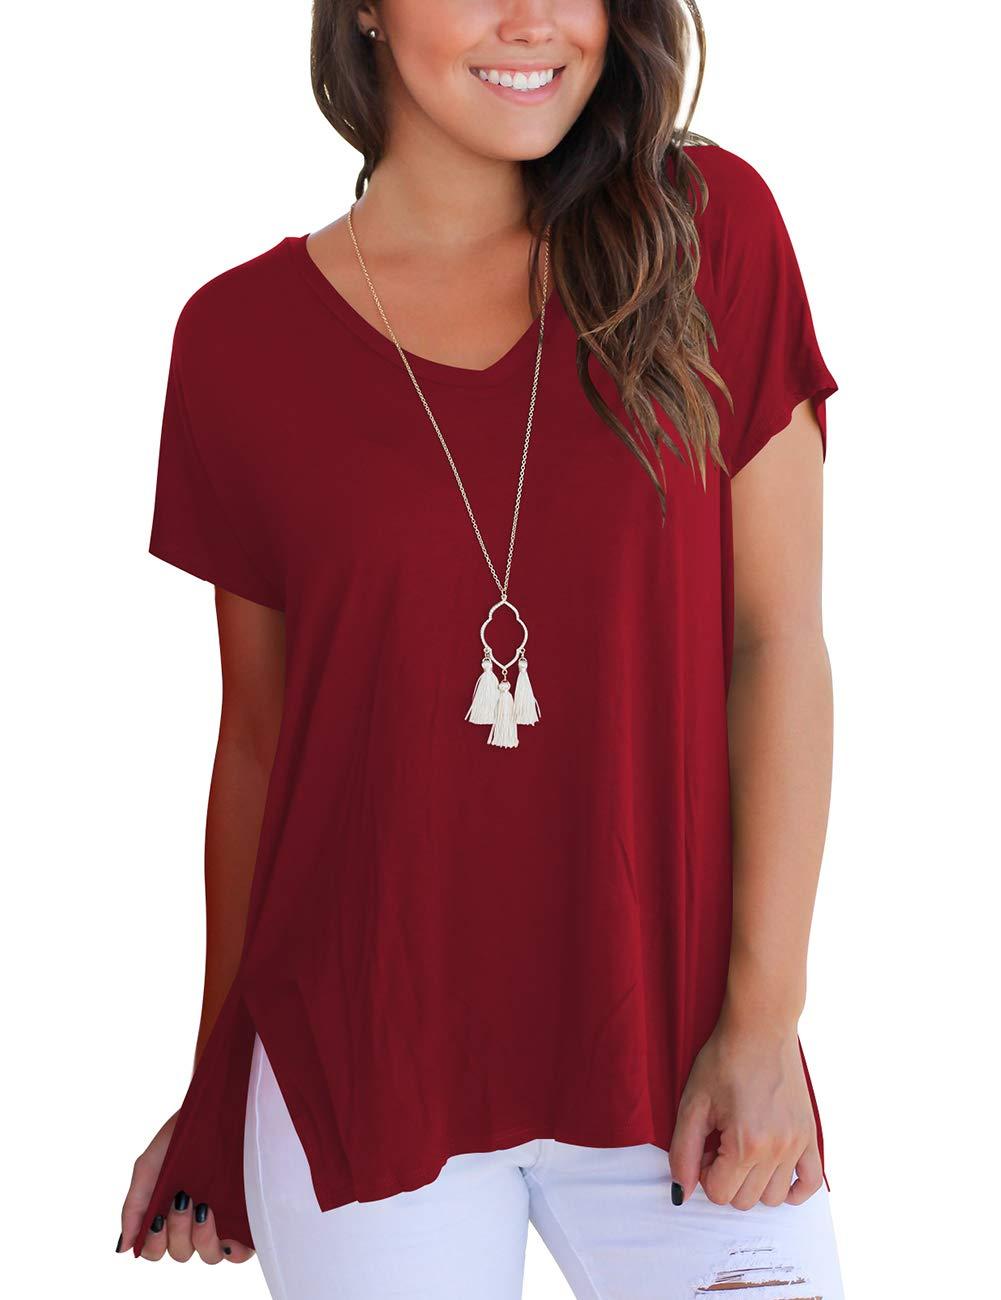 bfd126f77808 Short Sleeve T Shirt Women Cotton Basic Plain Loose Tee Tops with Split  Burgundy M